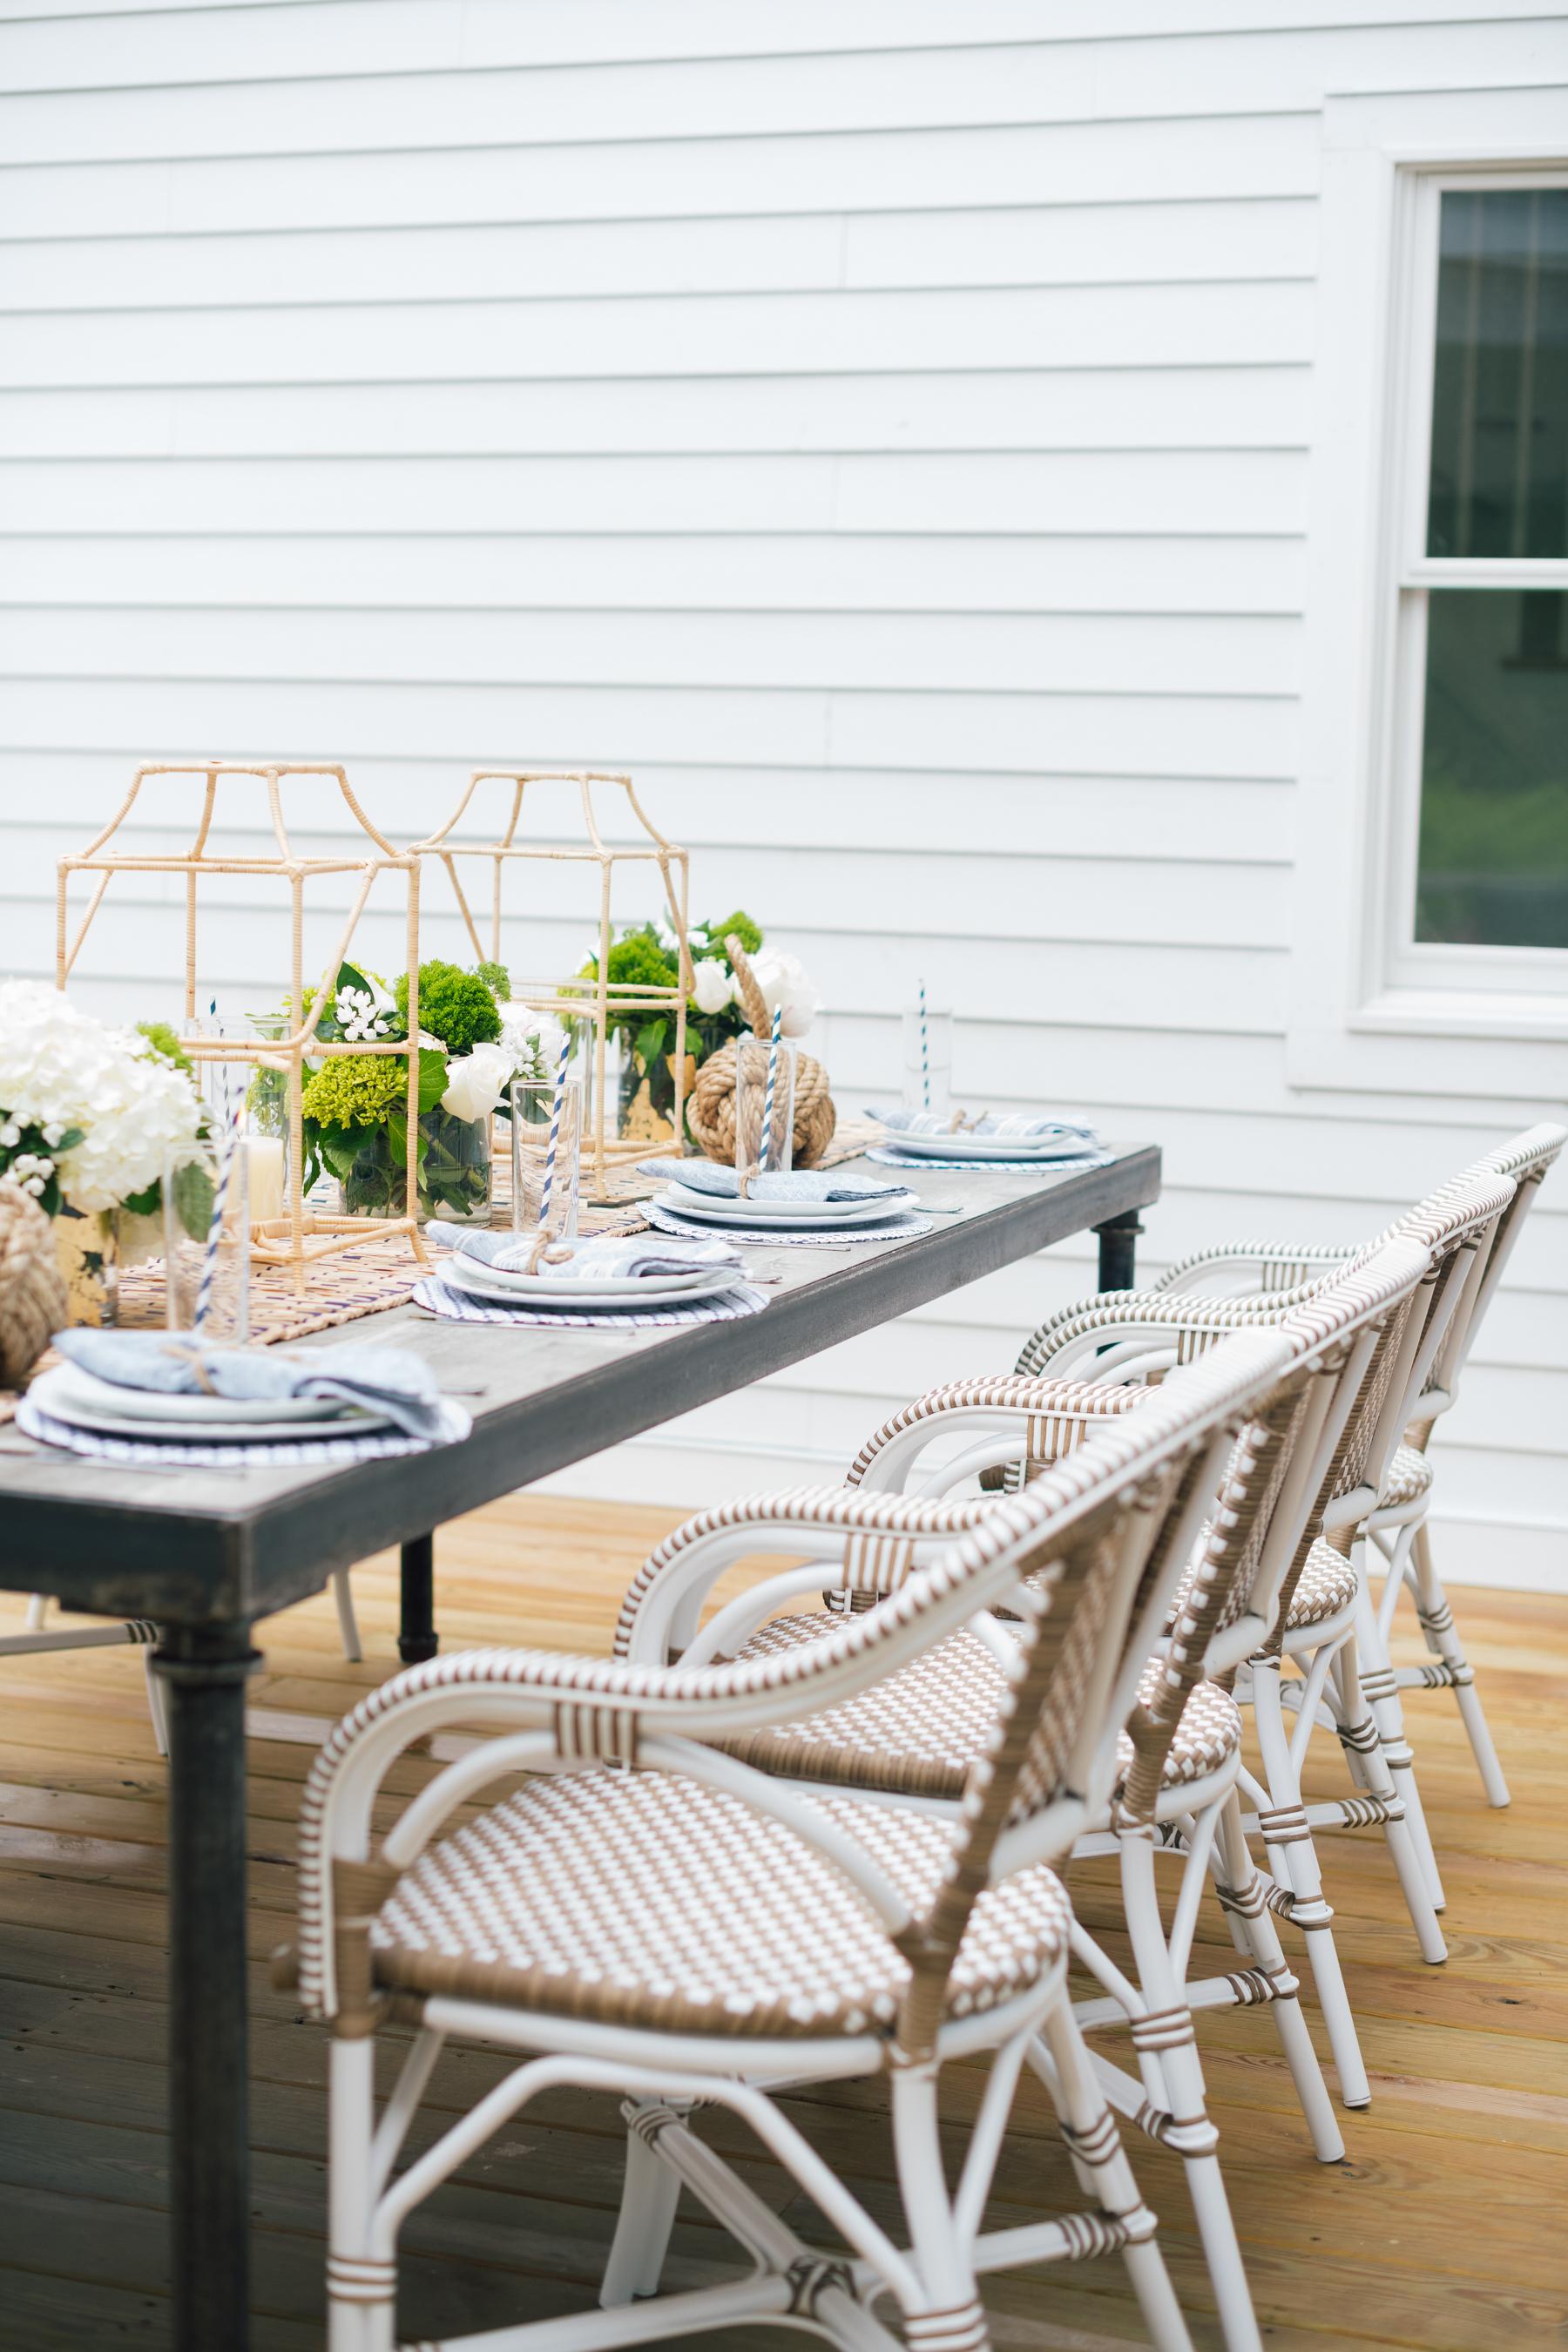 Serena and Lily tabletop decor at Eva Amurri Martino's summer clambake